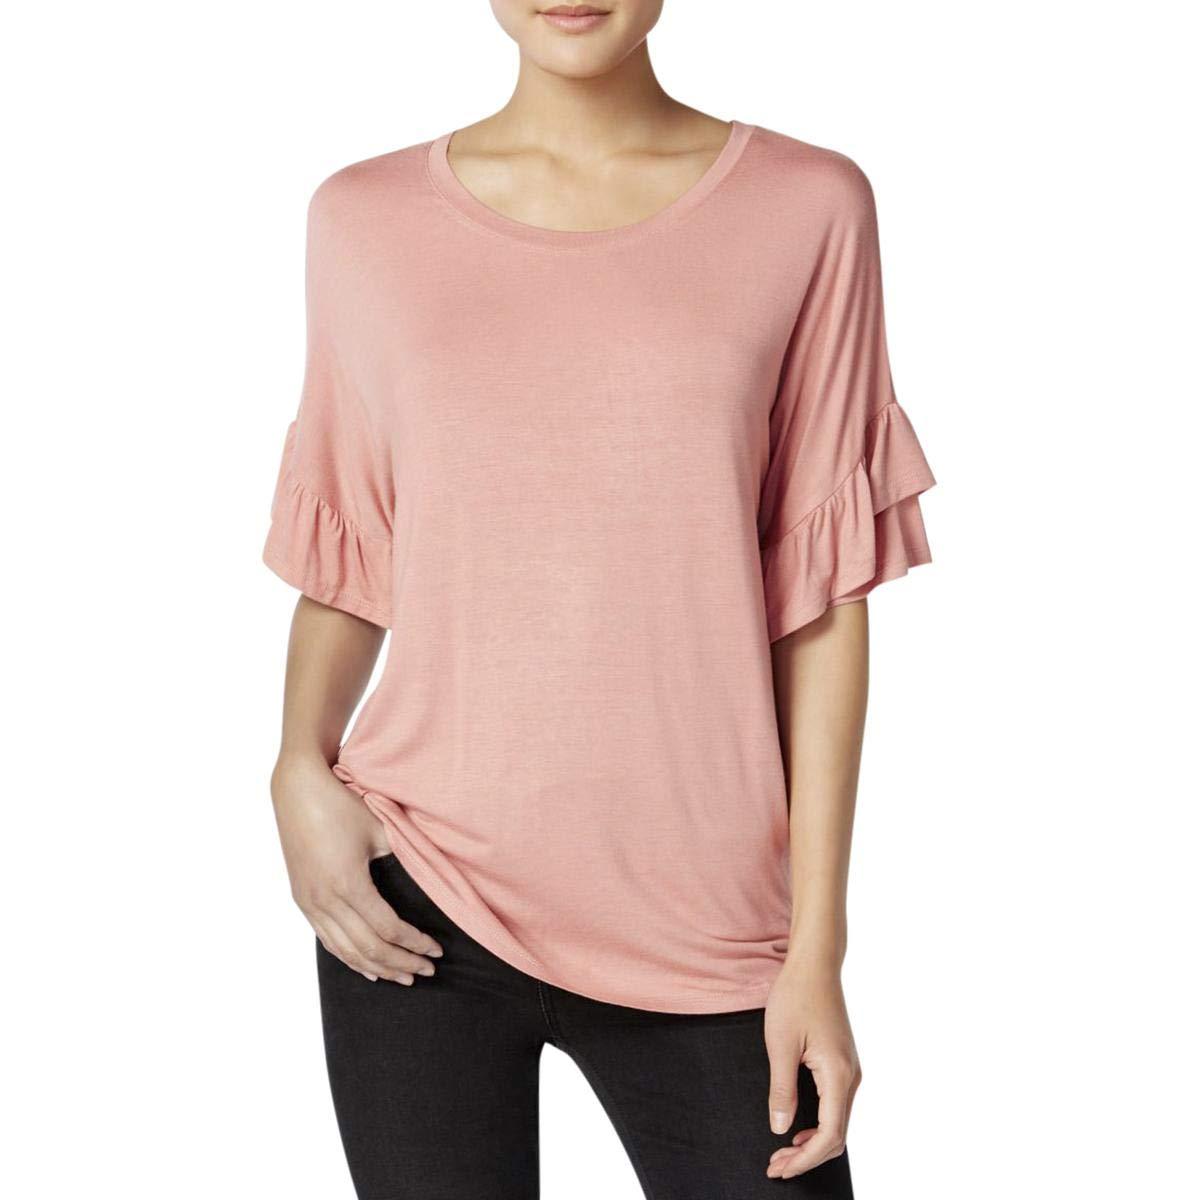 Jamie /& Layla Womens Ruffle Sleeve Crew Neck T-Shirt